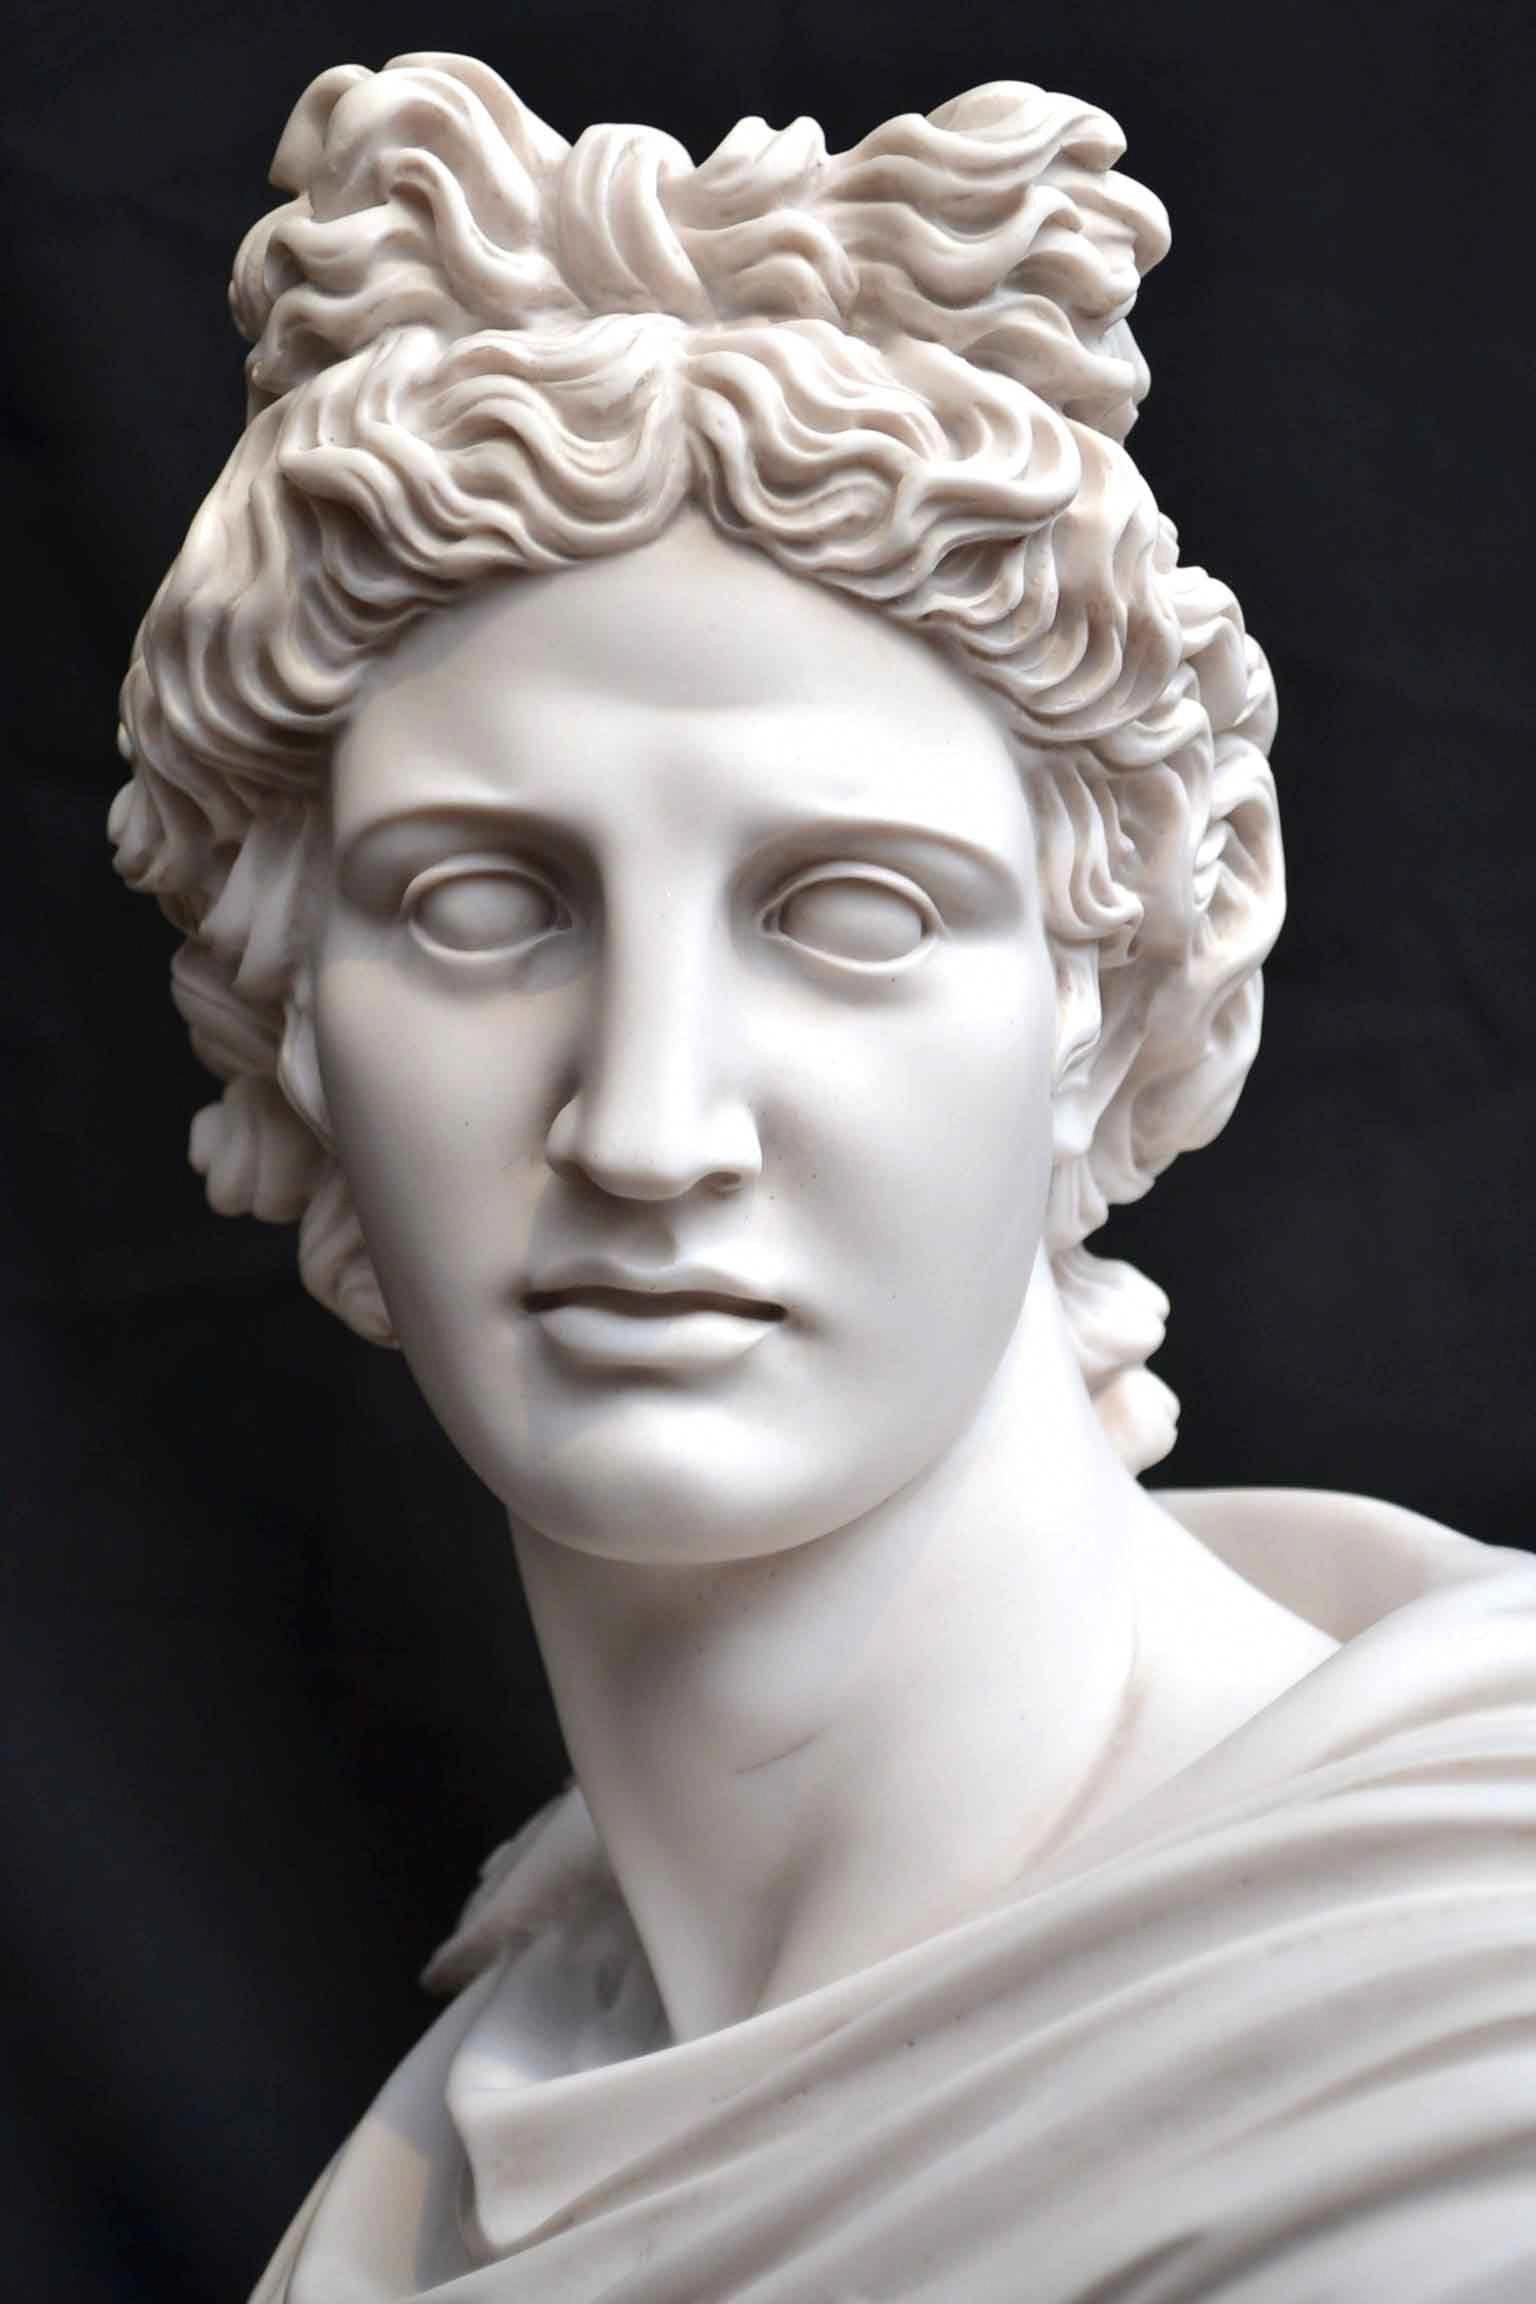 Statues Louvre #InexpensiveGardenStatues #•STATUES• #greekstatue